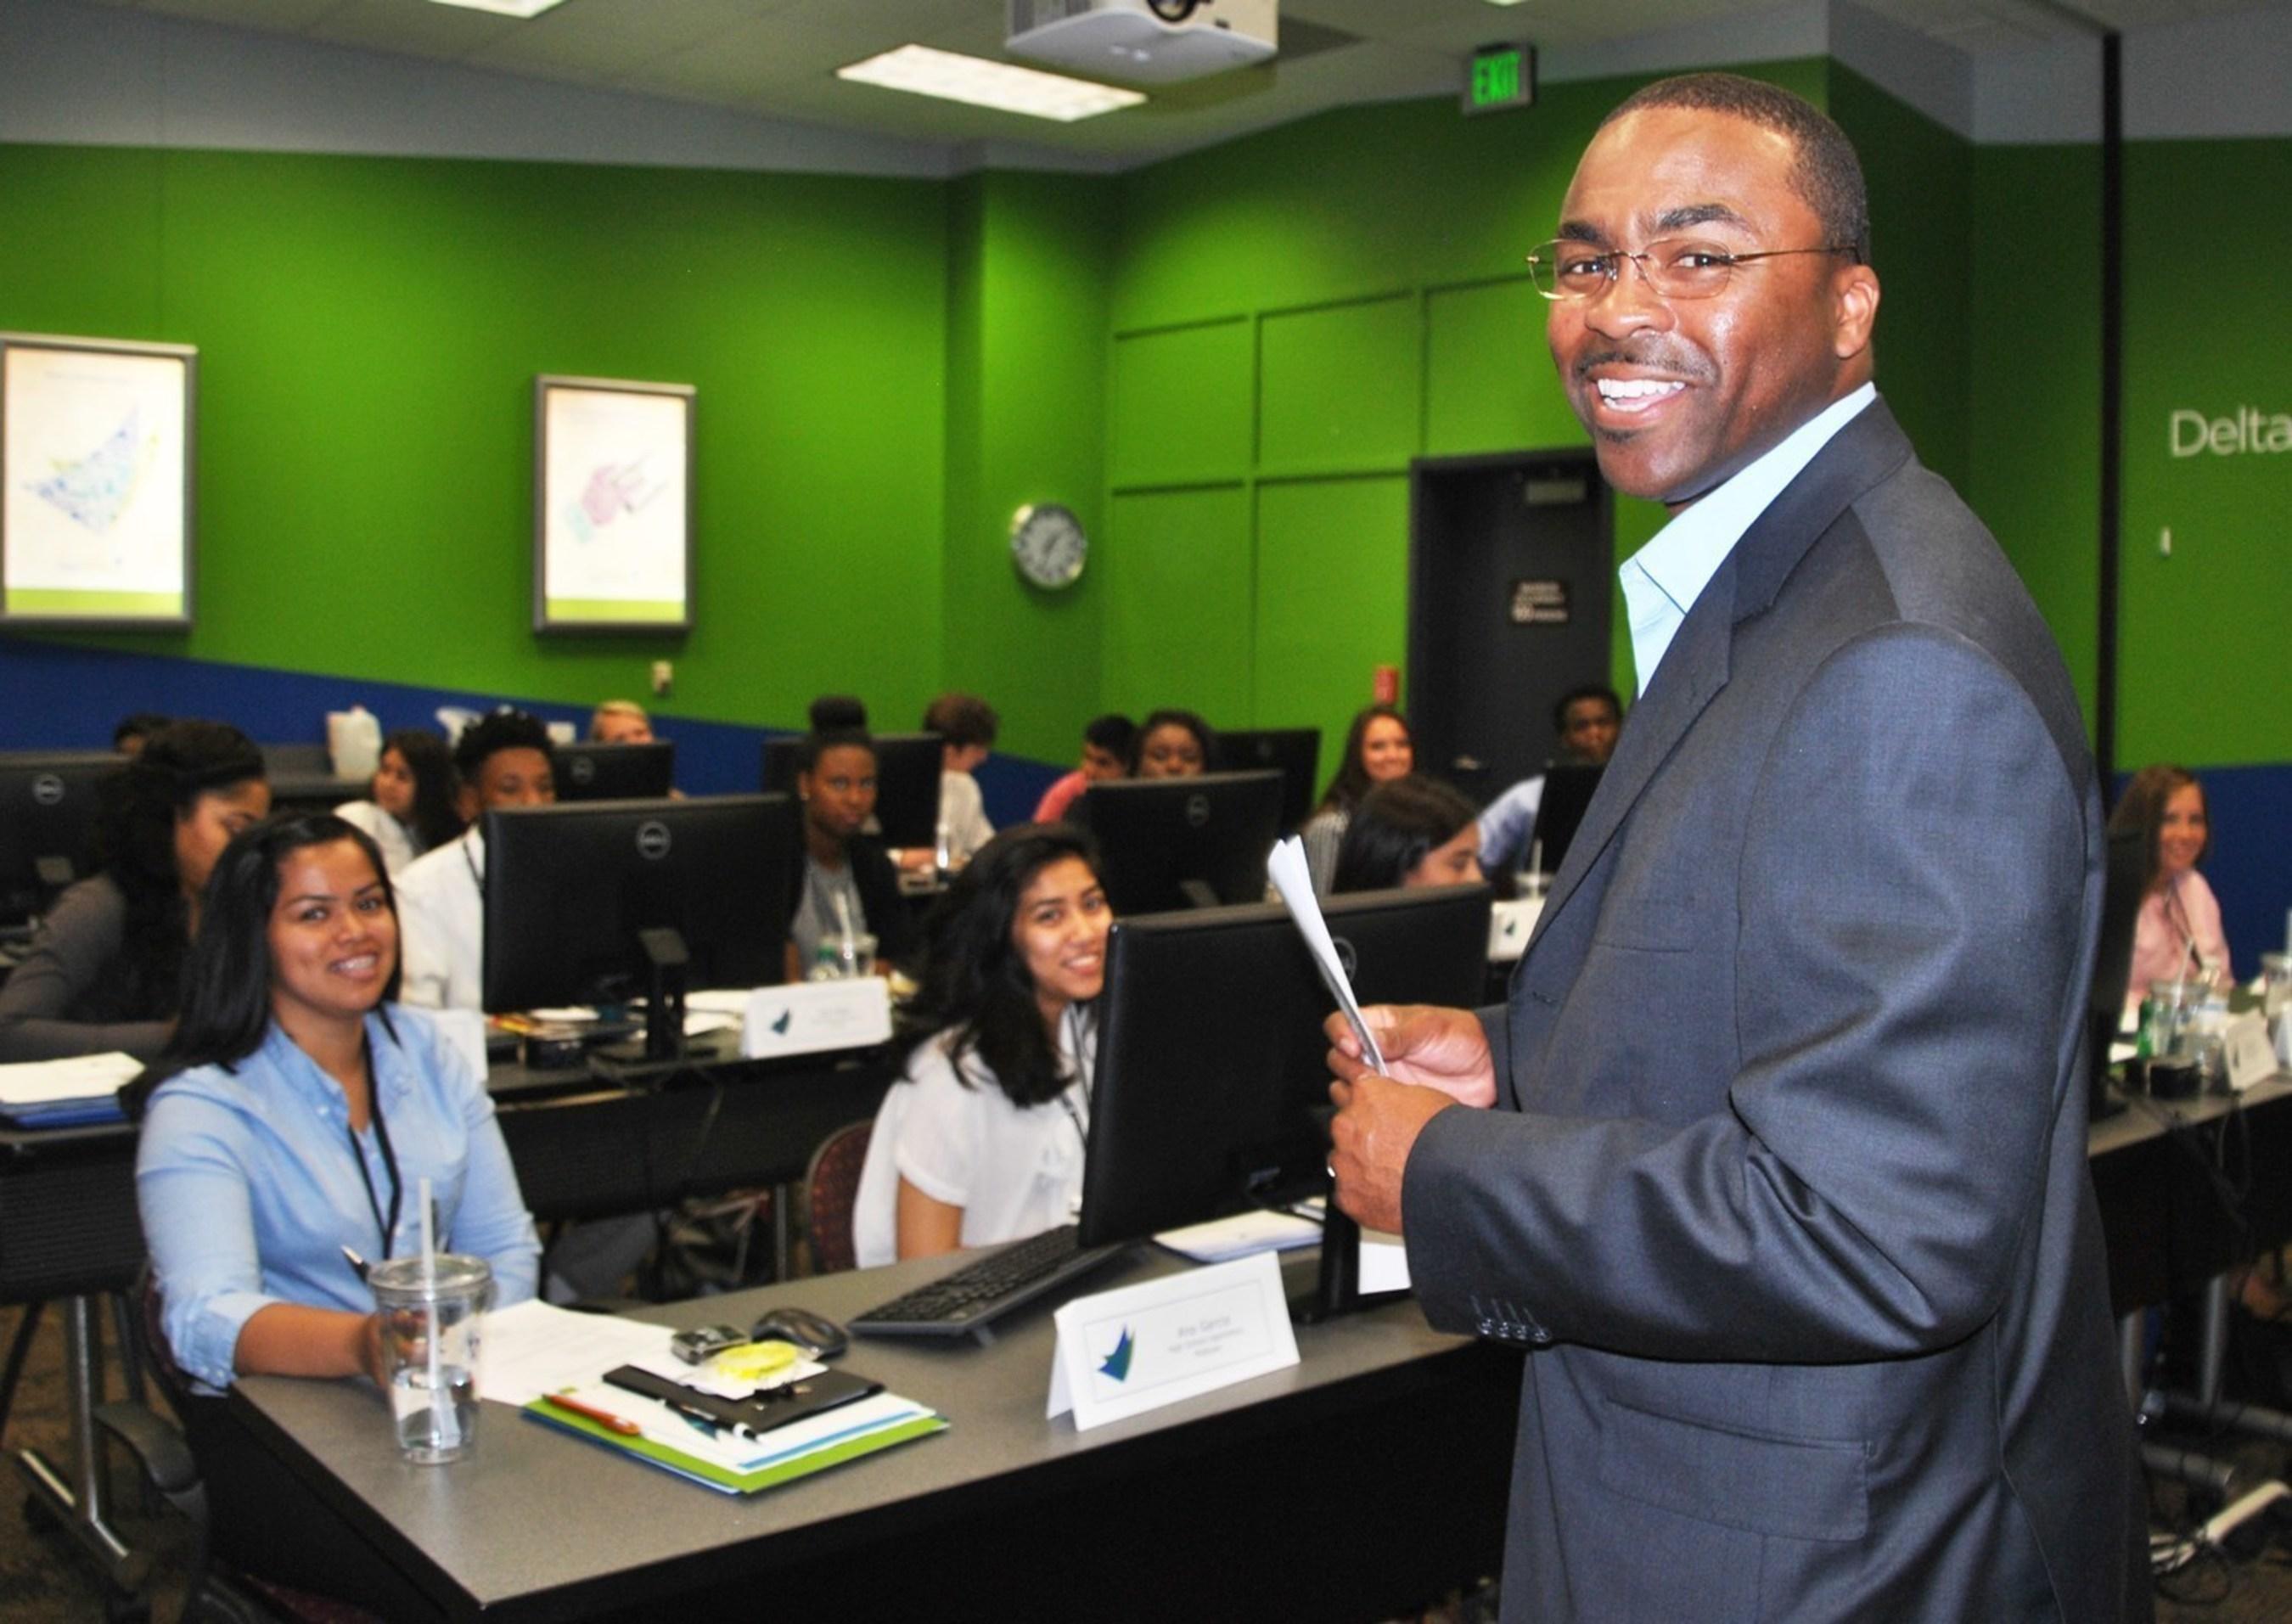 Learning Facilitator Garrett Turman addresses participants in the 2015 Delta Community High School Apprentice Program.